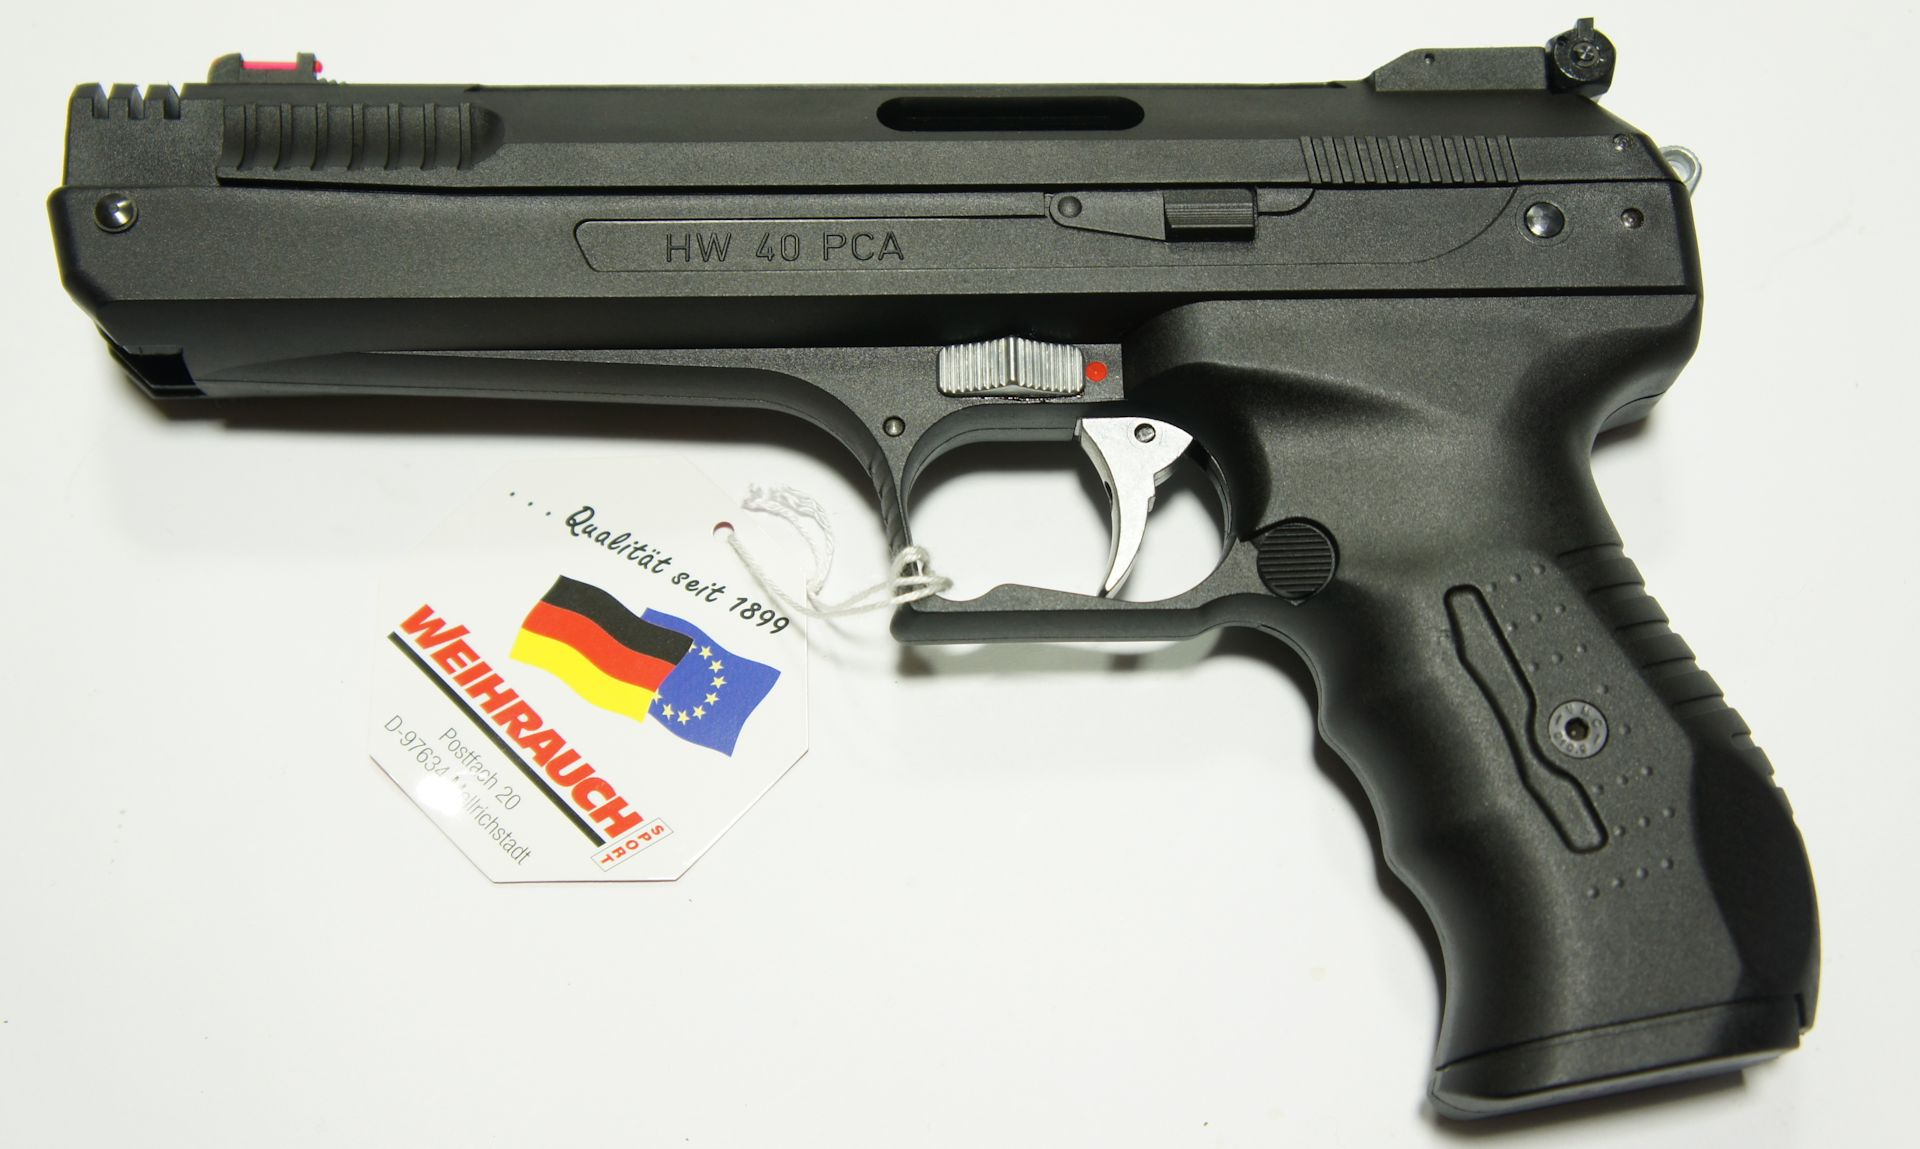 HW 40 PCA Luftpistole